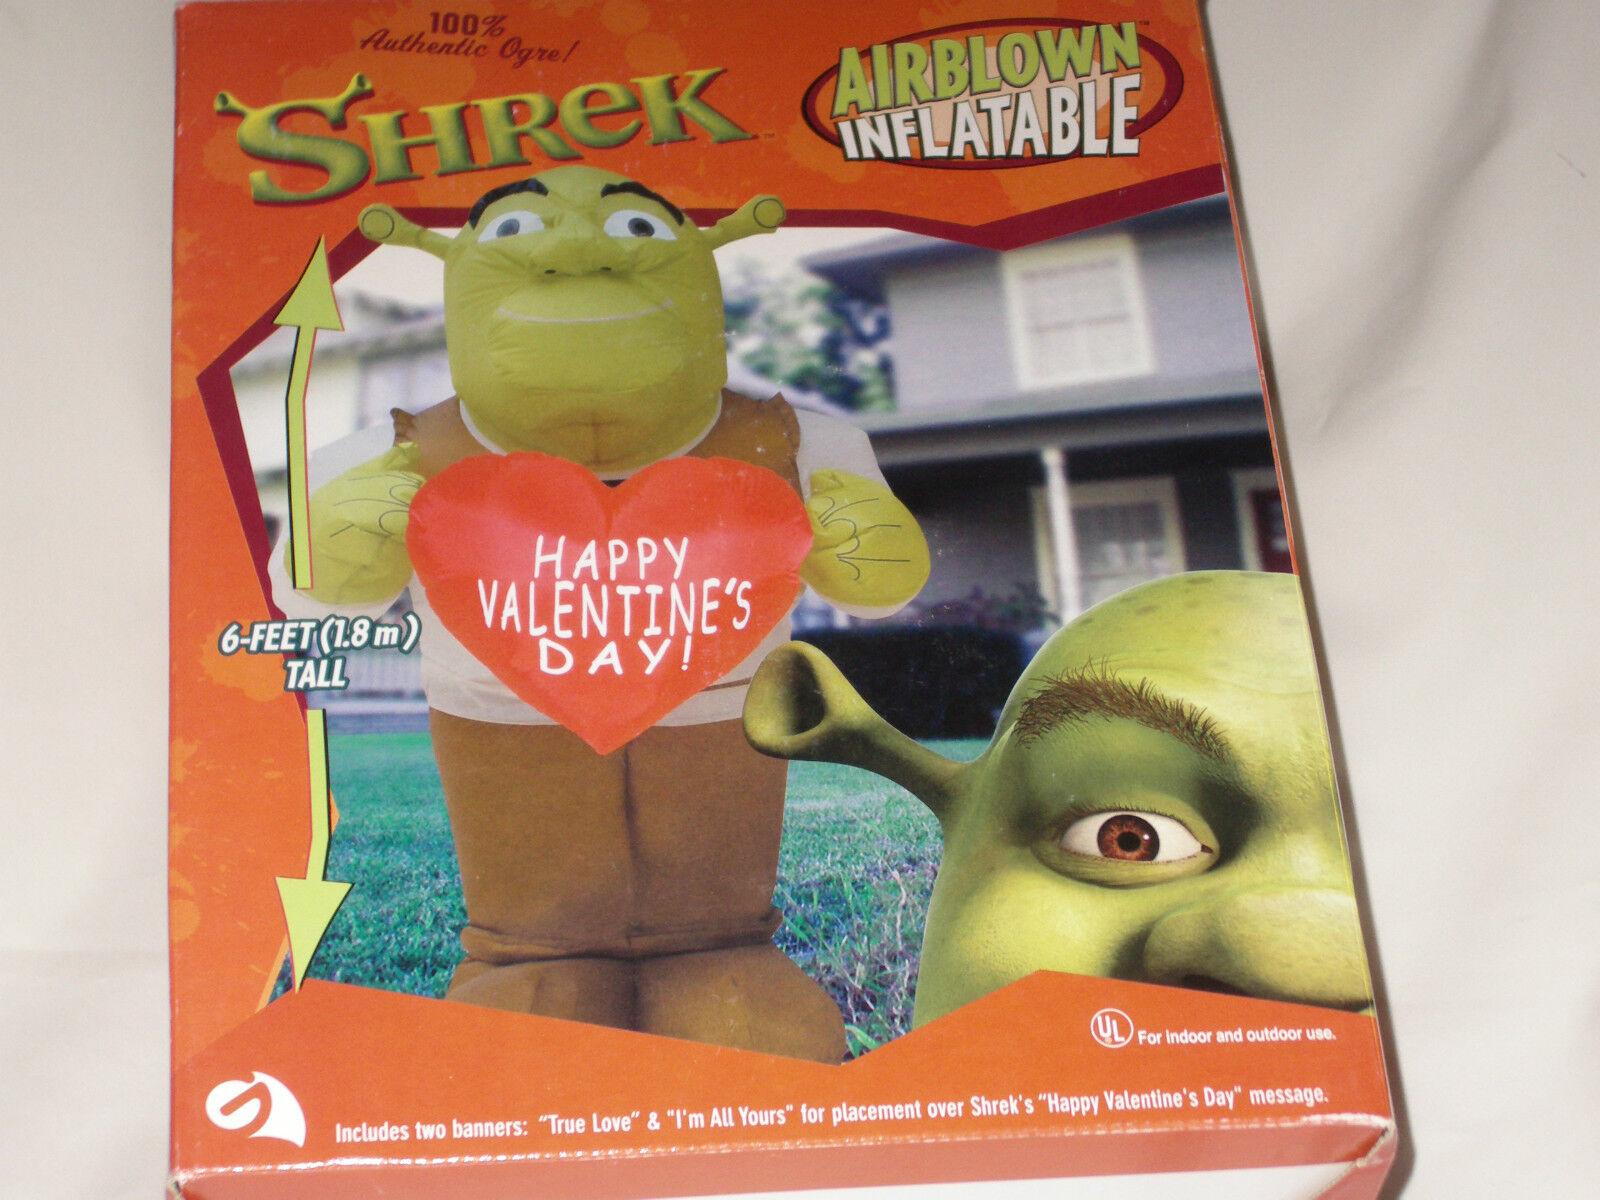 New gemmy valentines day lighted shrek ogre airblown